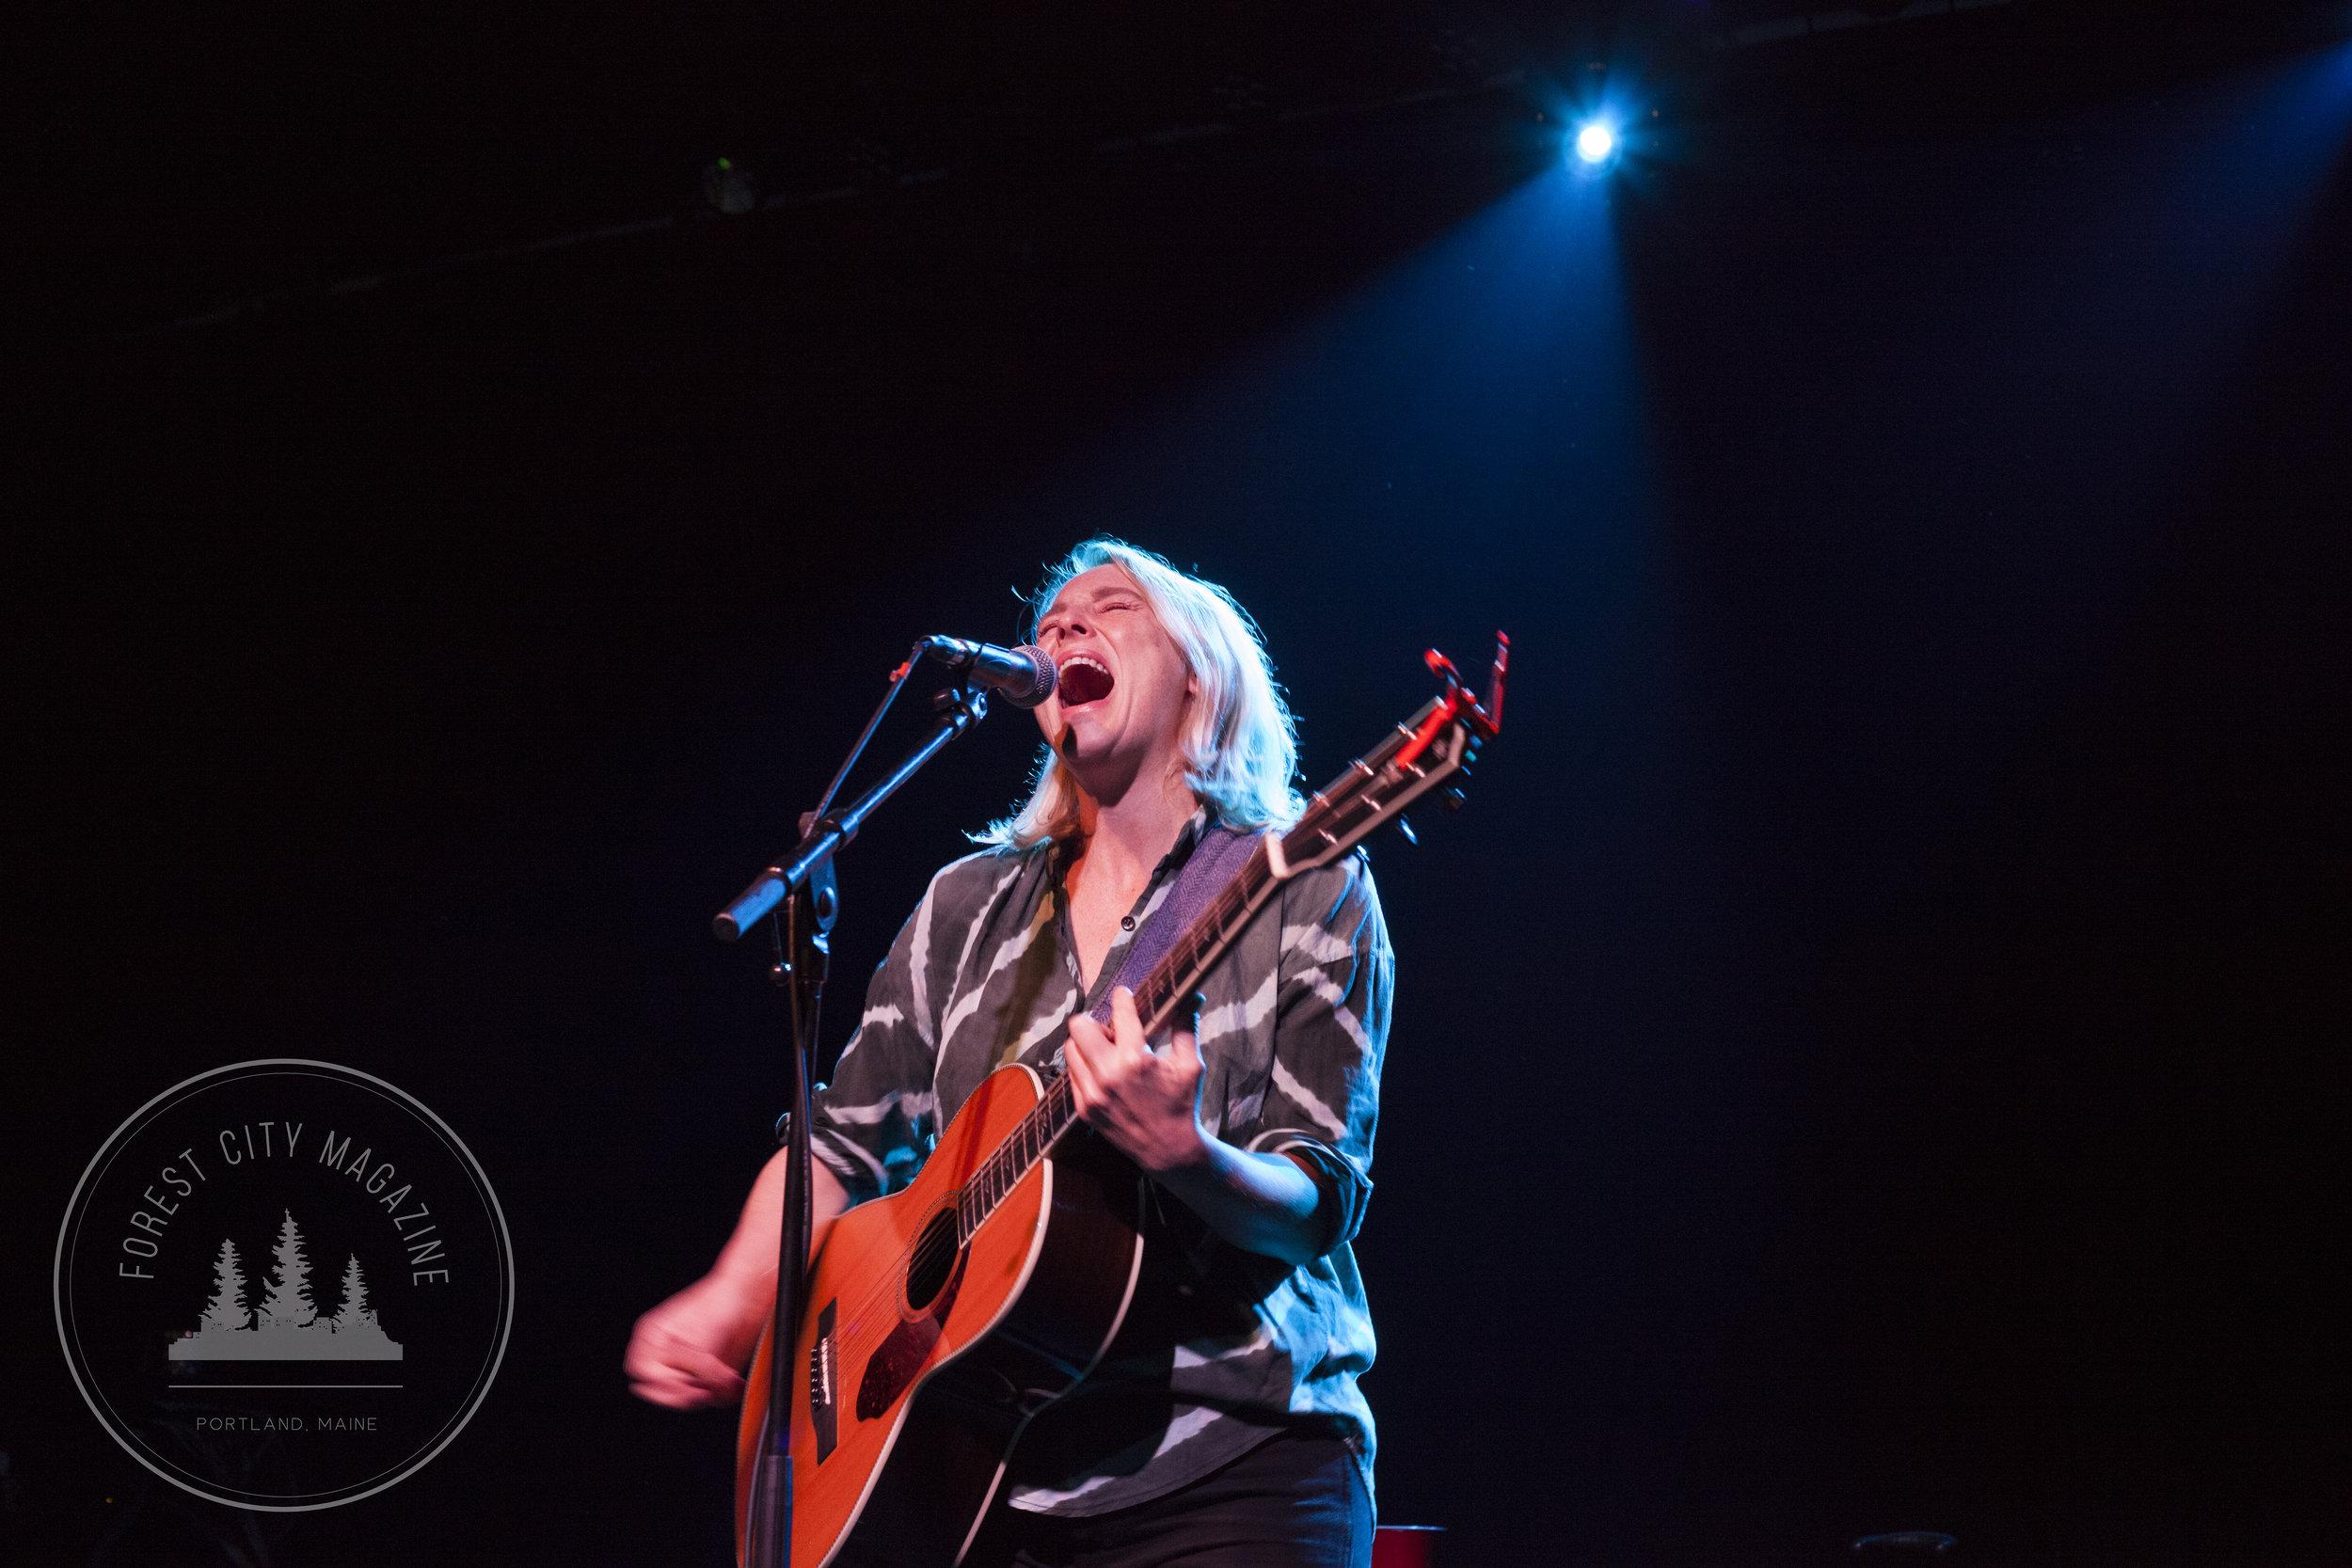 Lissie - Photos By:Kelsey Riordan